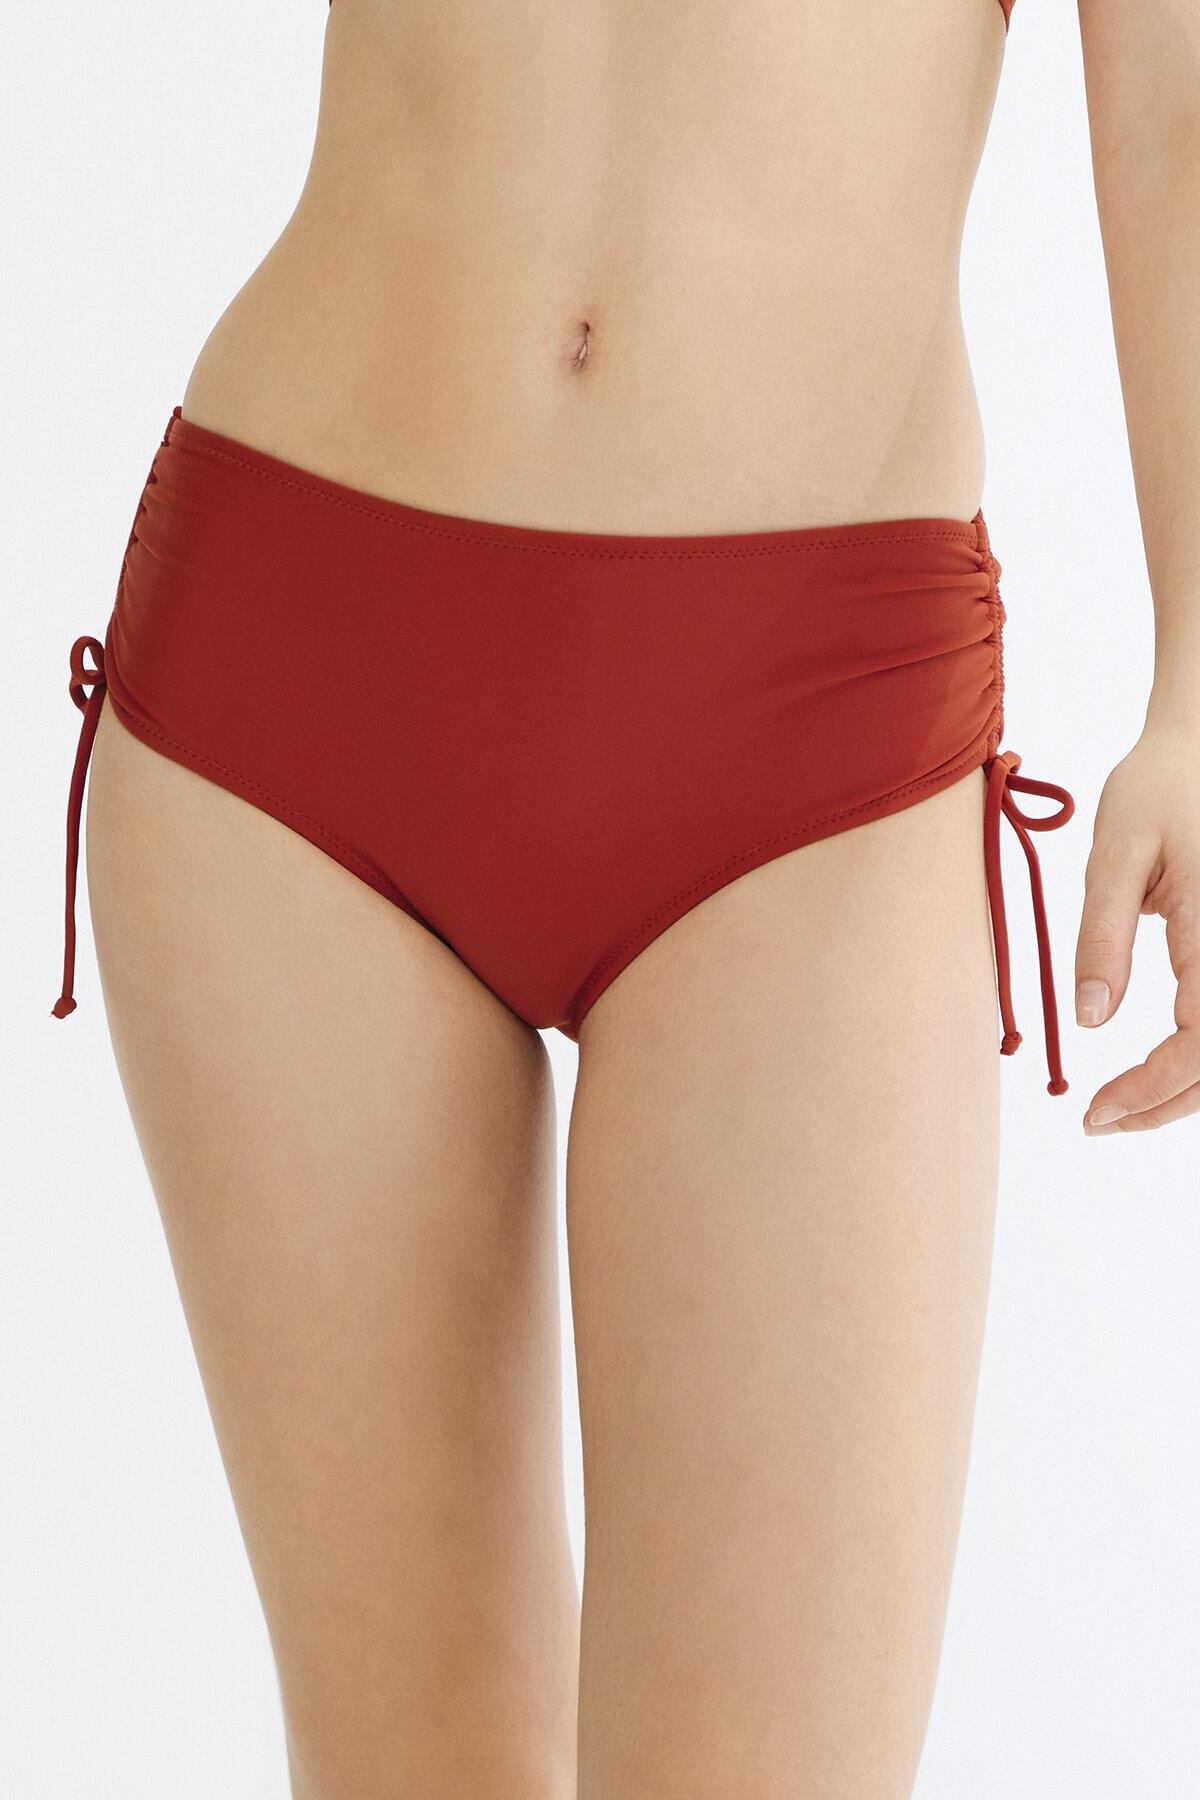 Penti Turuncu Basic Yüksek Bel Ring Bikini Altı 2